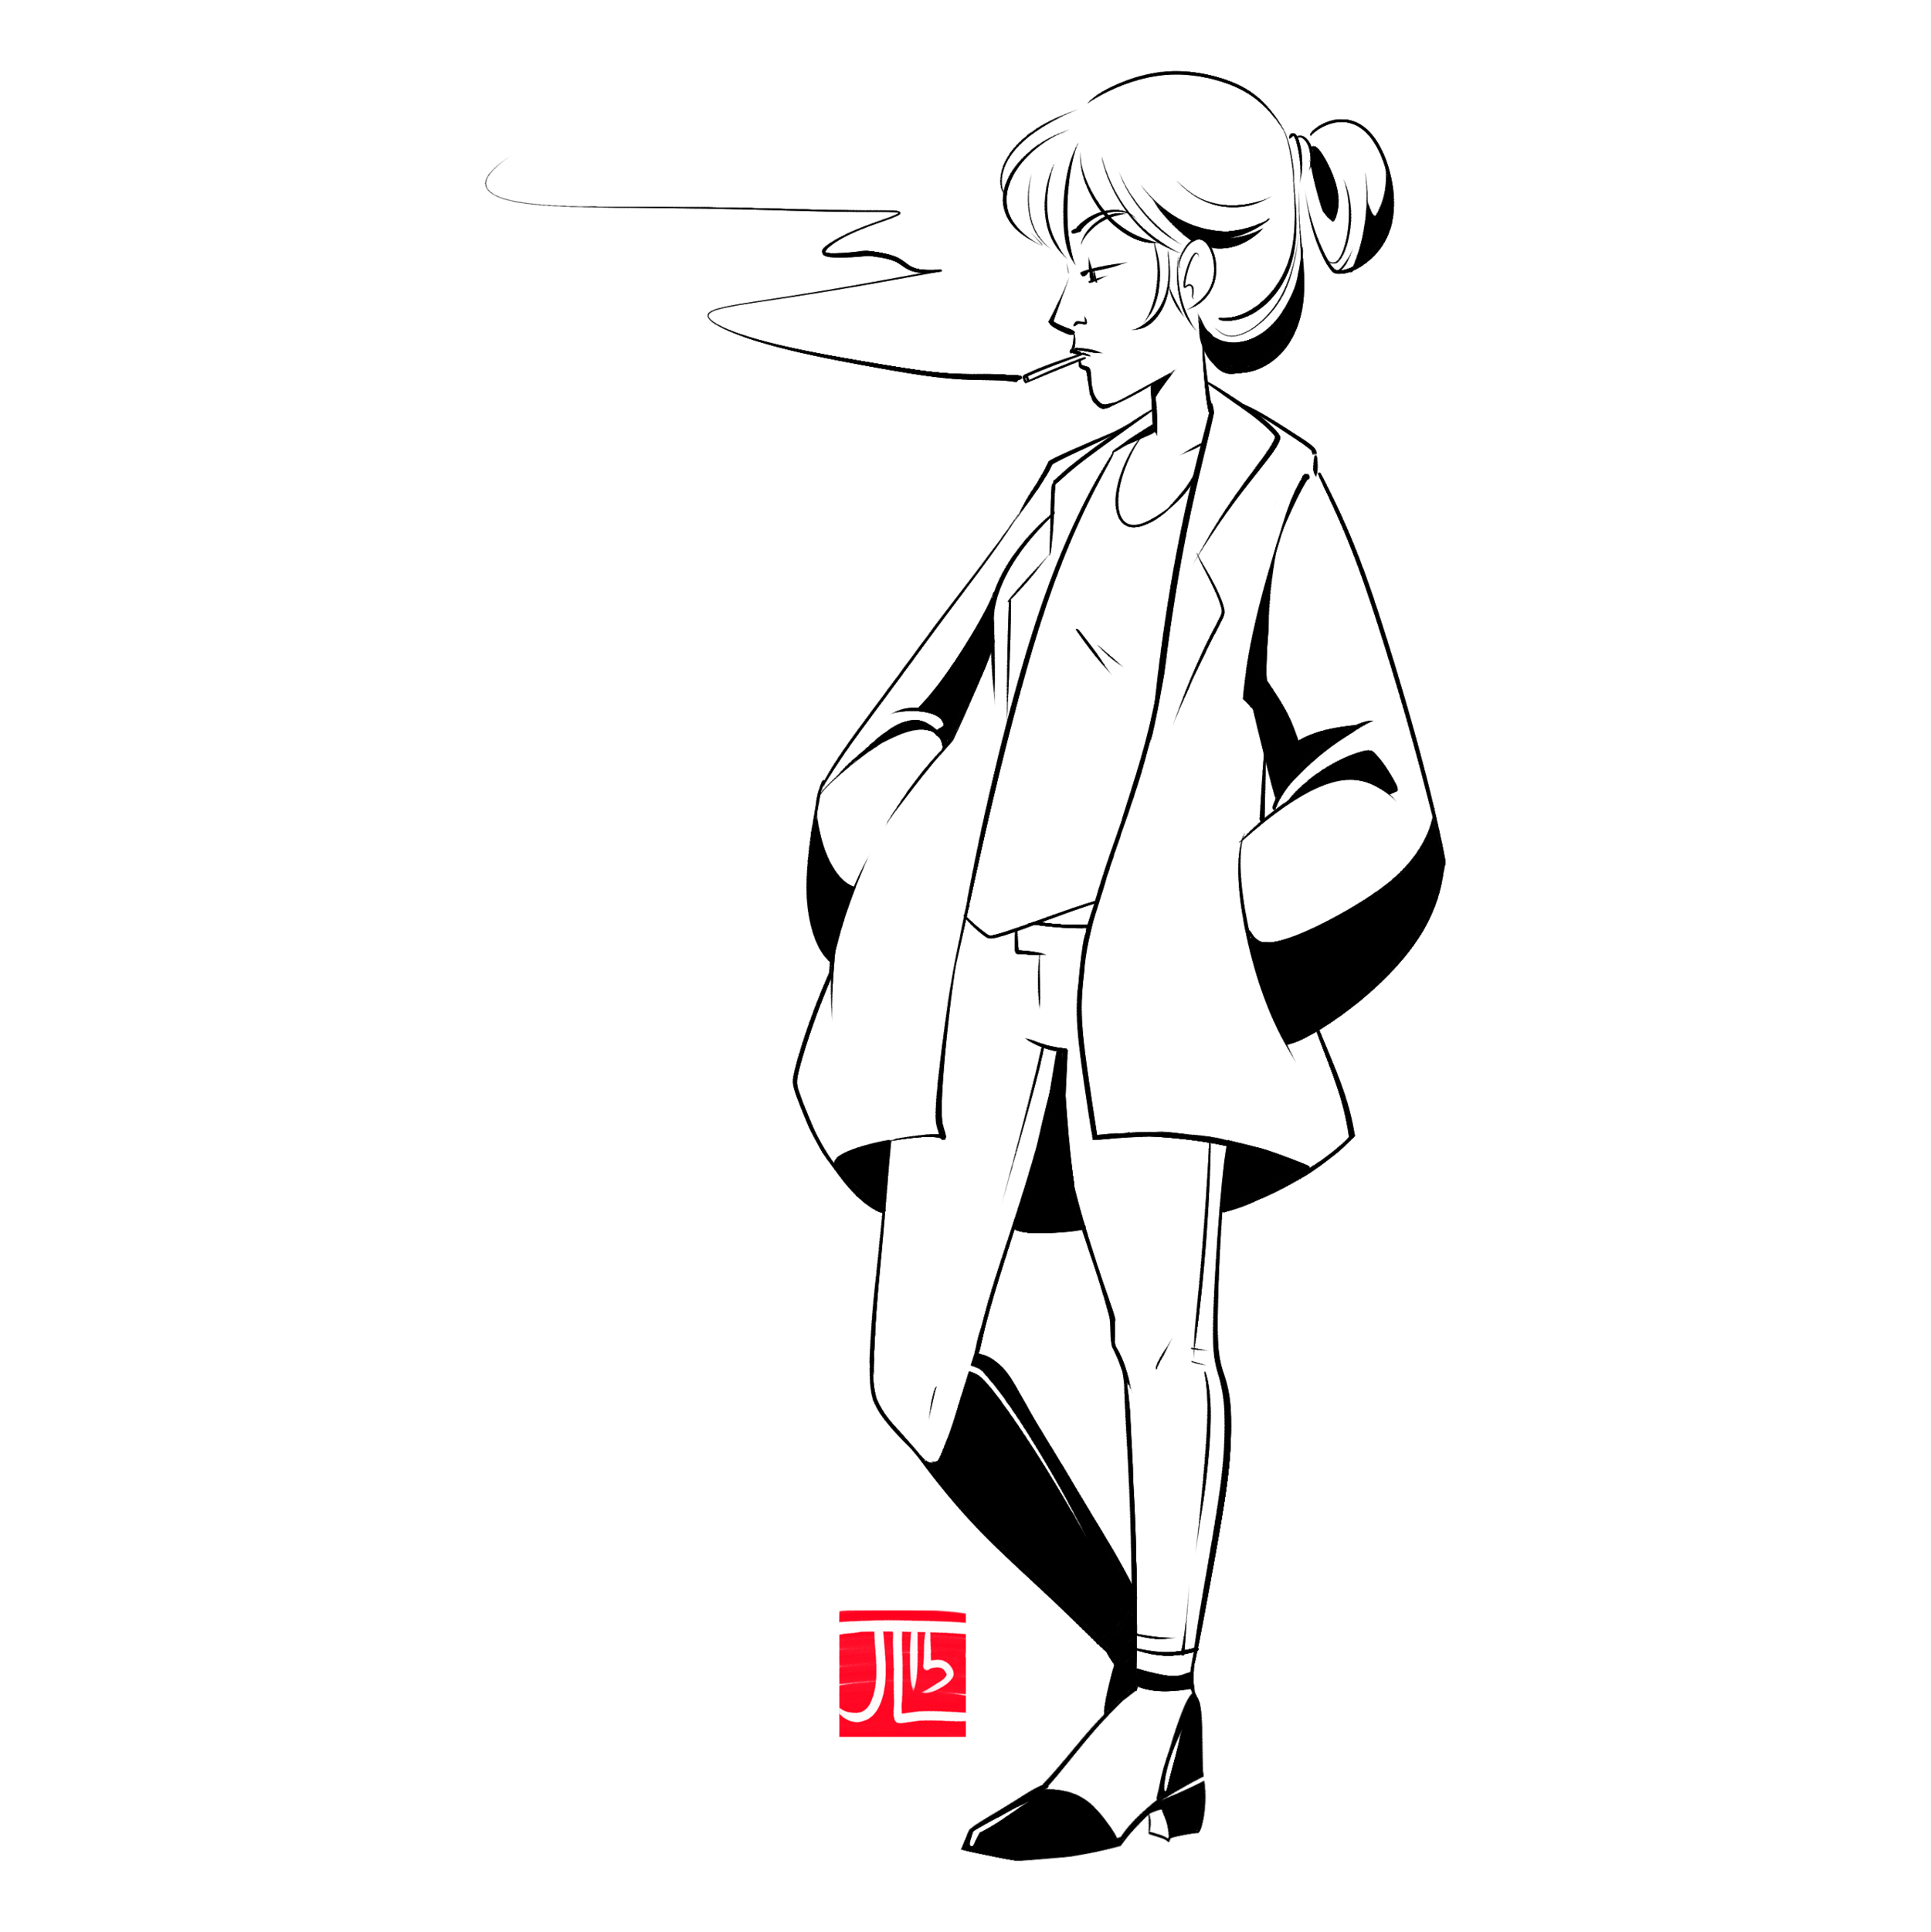 2015-Jia-min.png